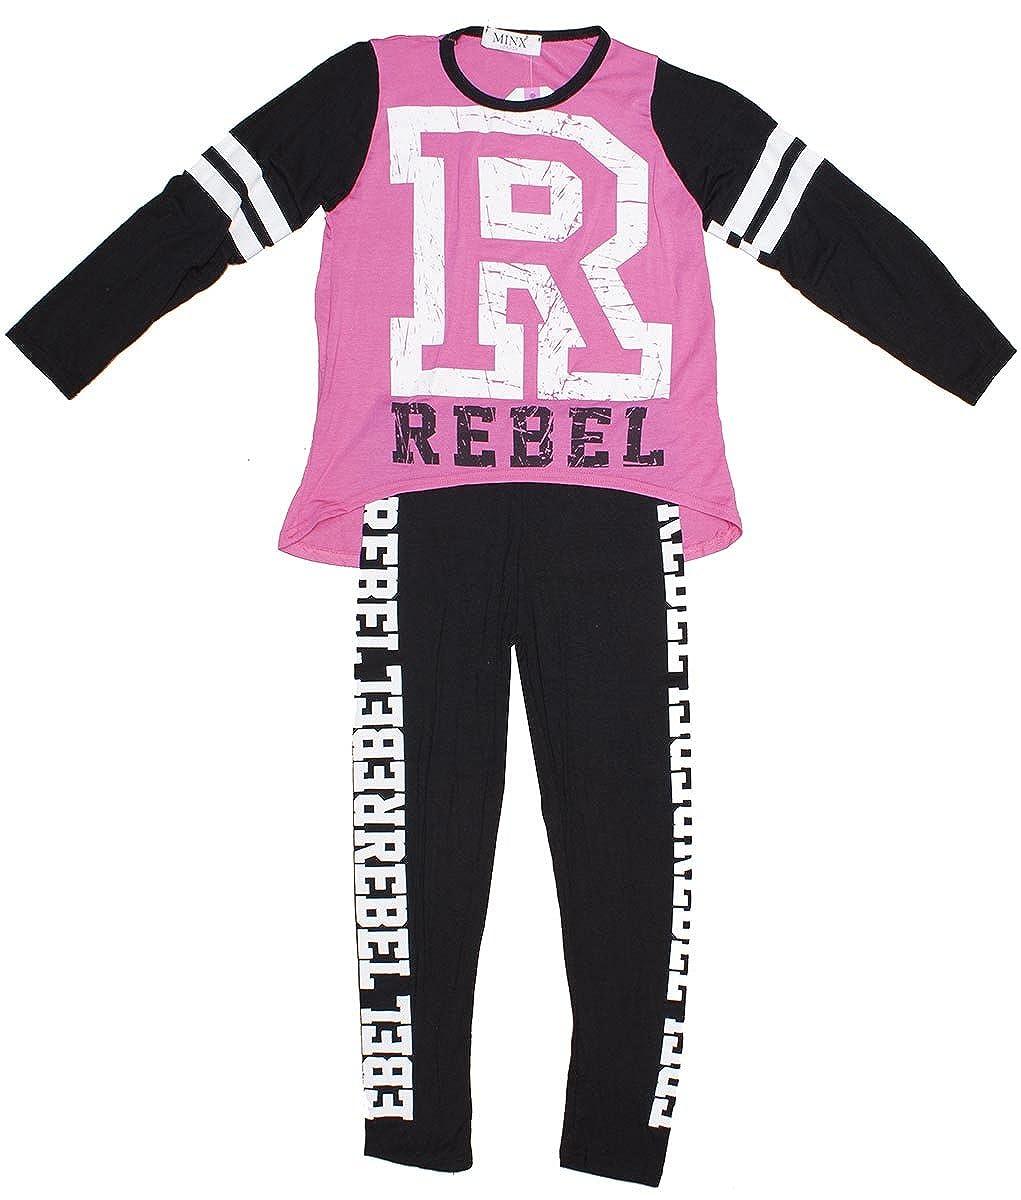 Minx Girls Rebel R Logo Long Sleeve Top & Leggings Dance Set Sizes from 7 to 13 Years